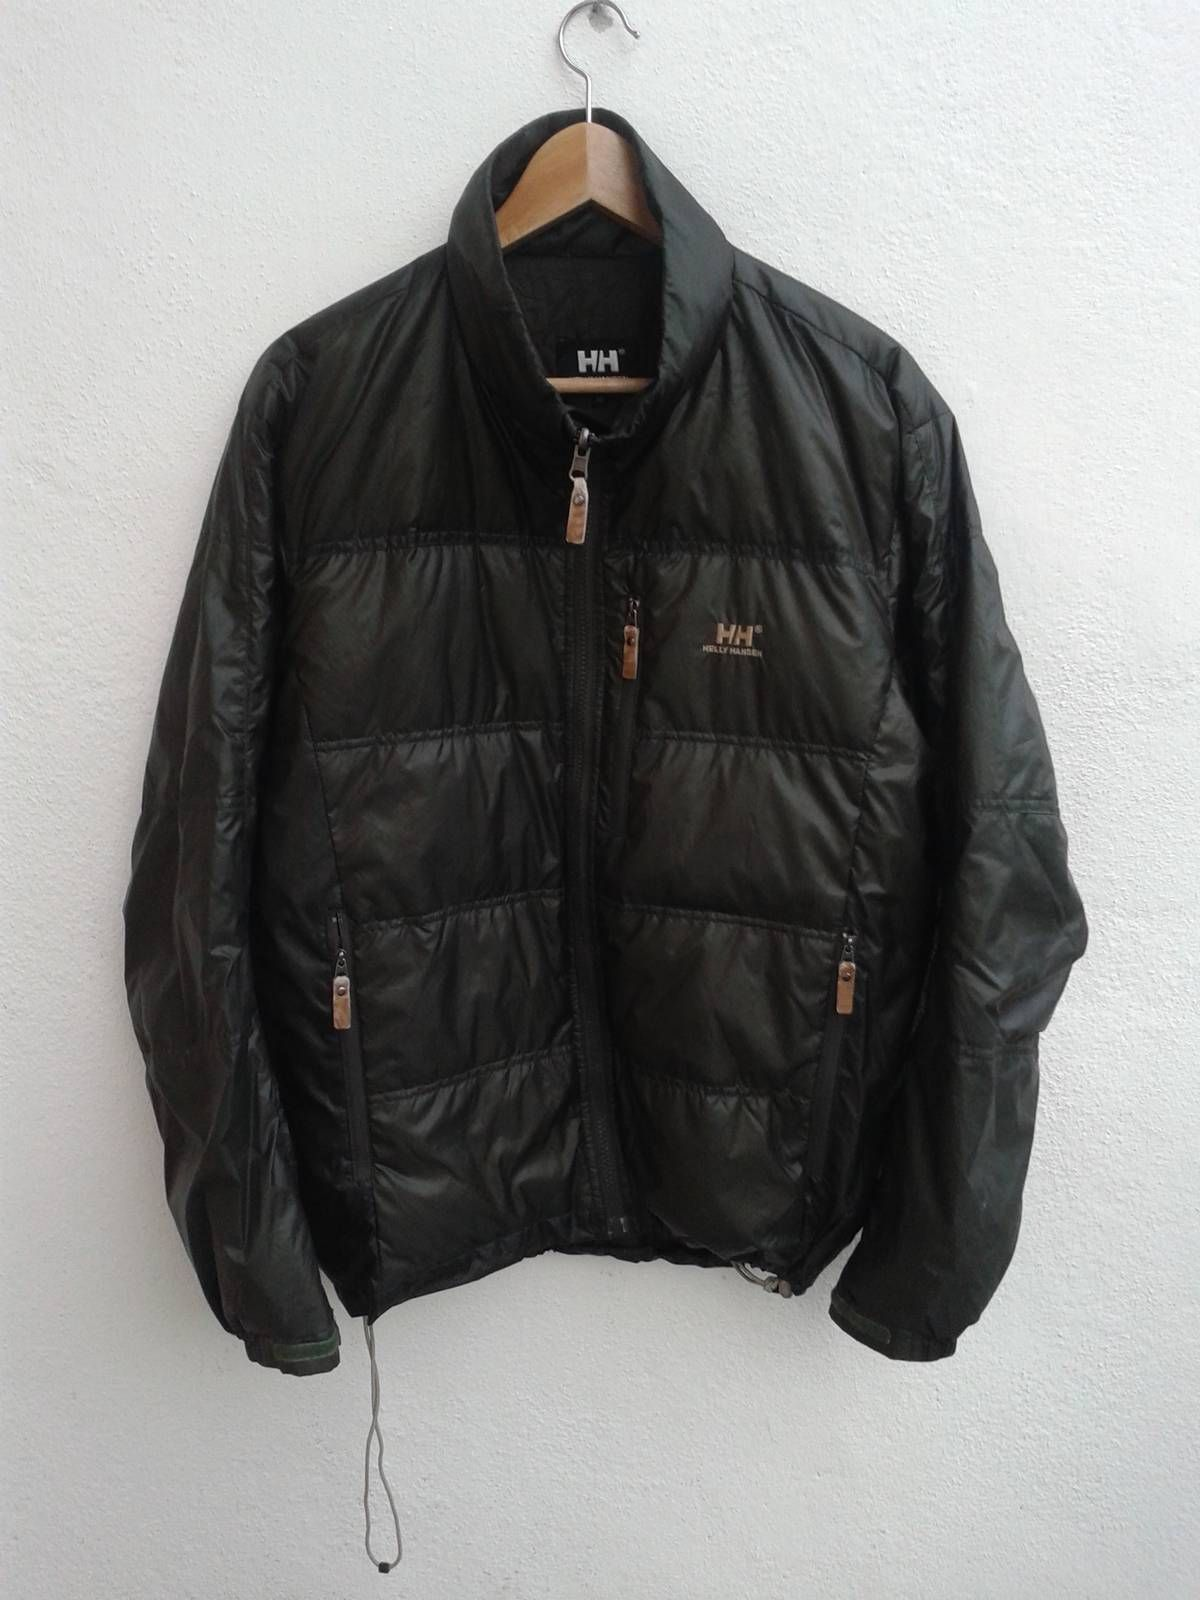 Helly Hansen Hh Goose Green Down Puffer Jacket Jackets Embroidered Monogram Down Jacket [ 1600 x 1200 Pixel ]